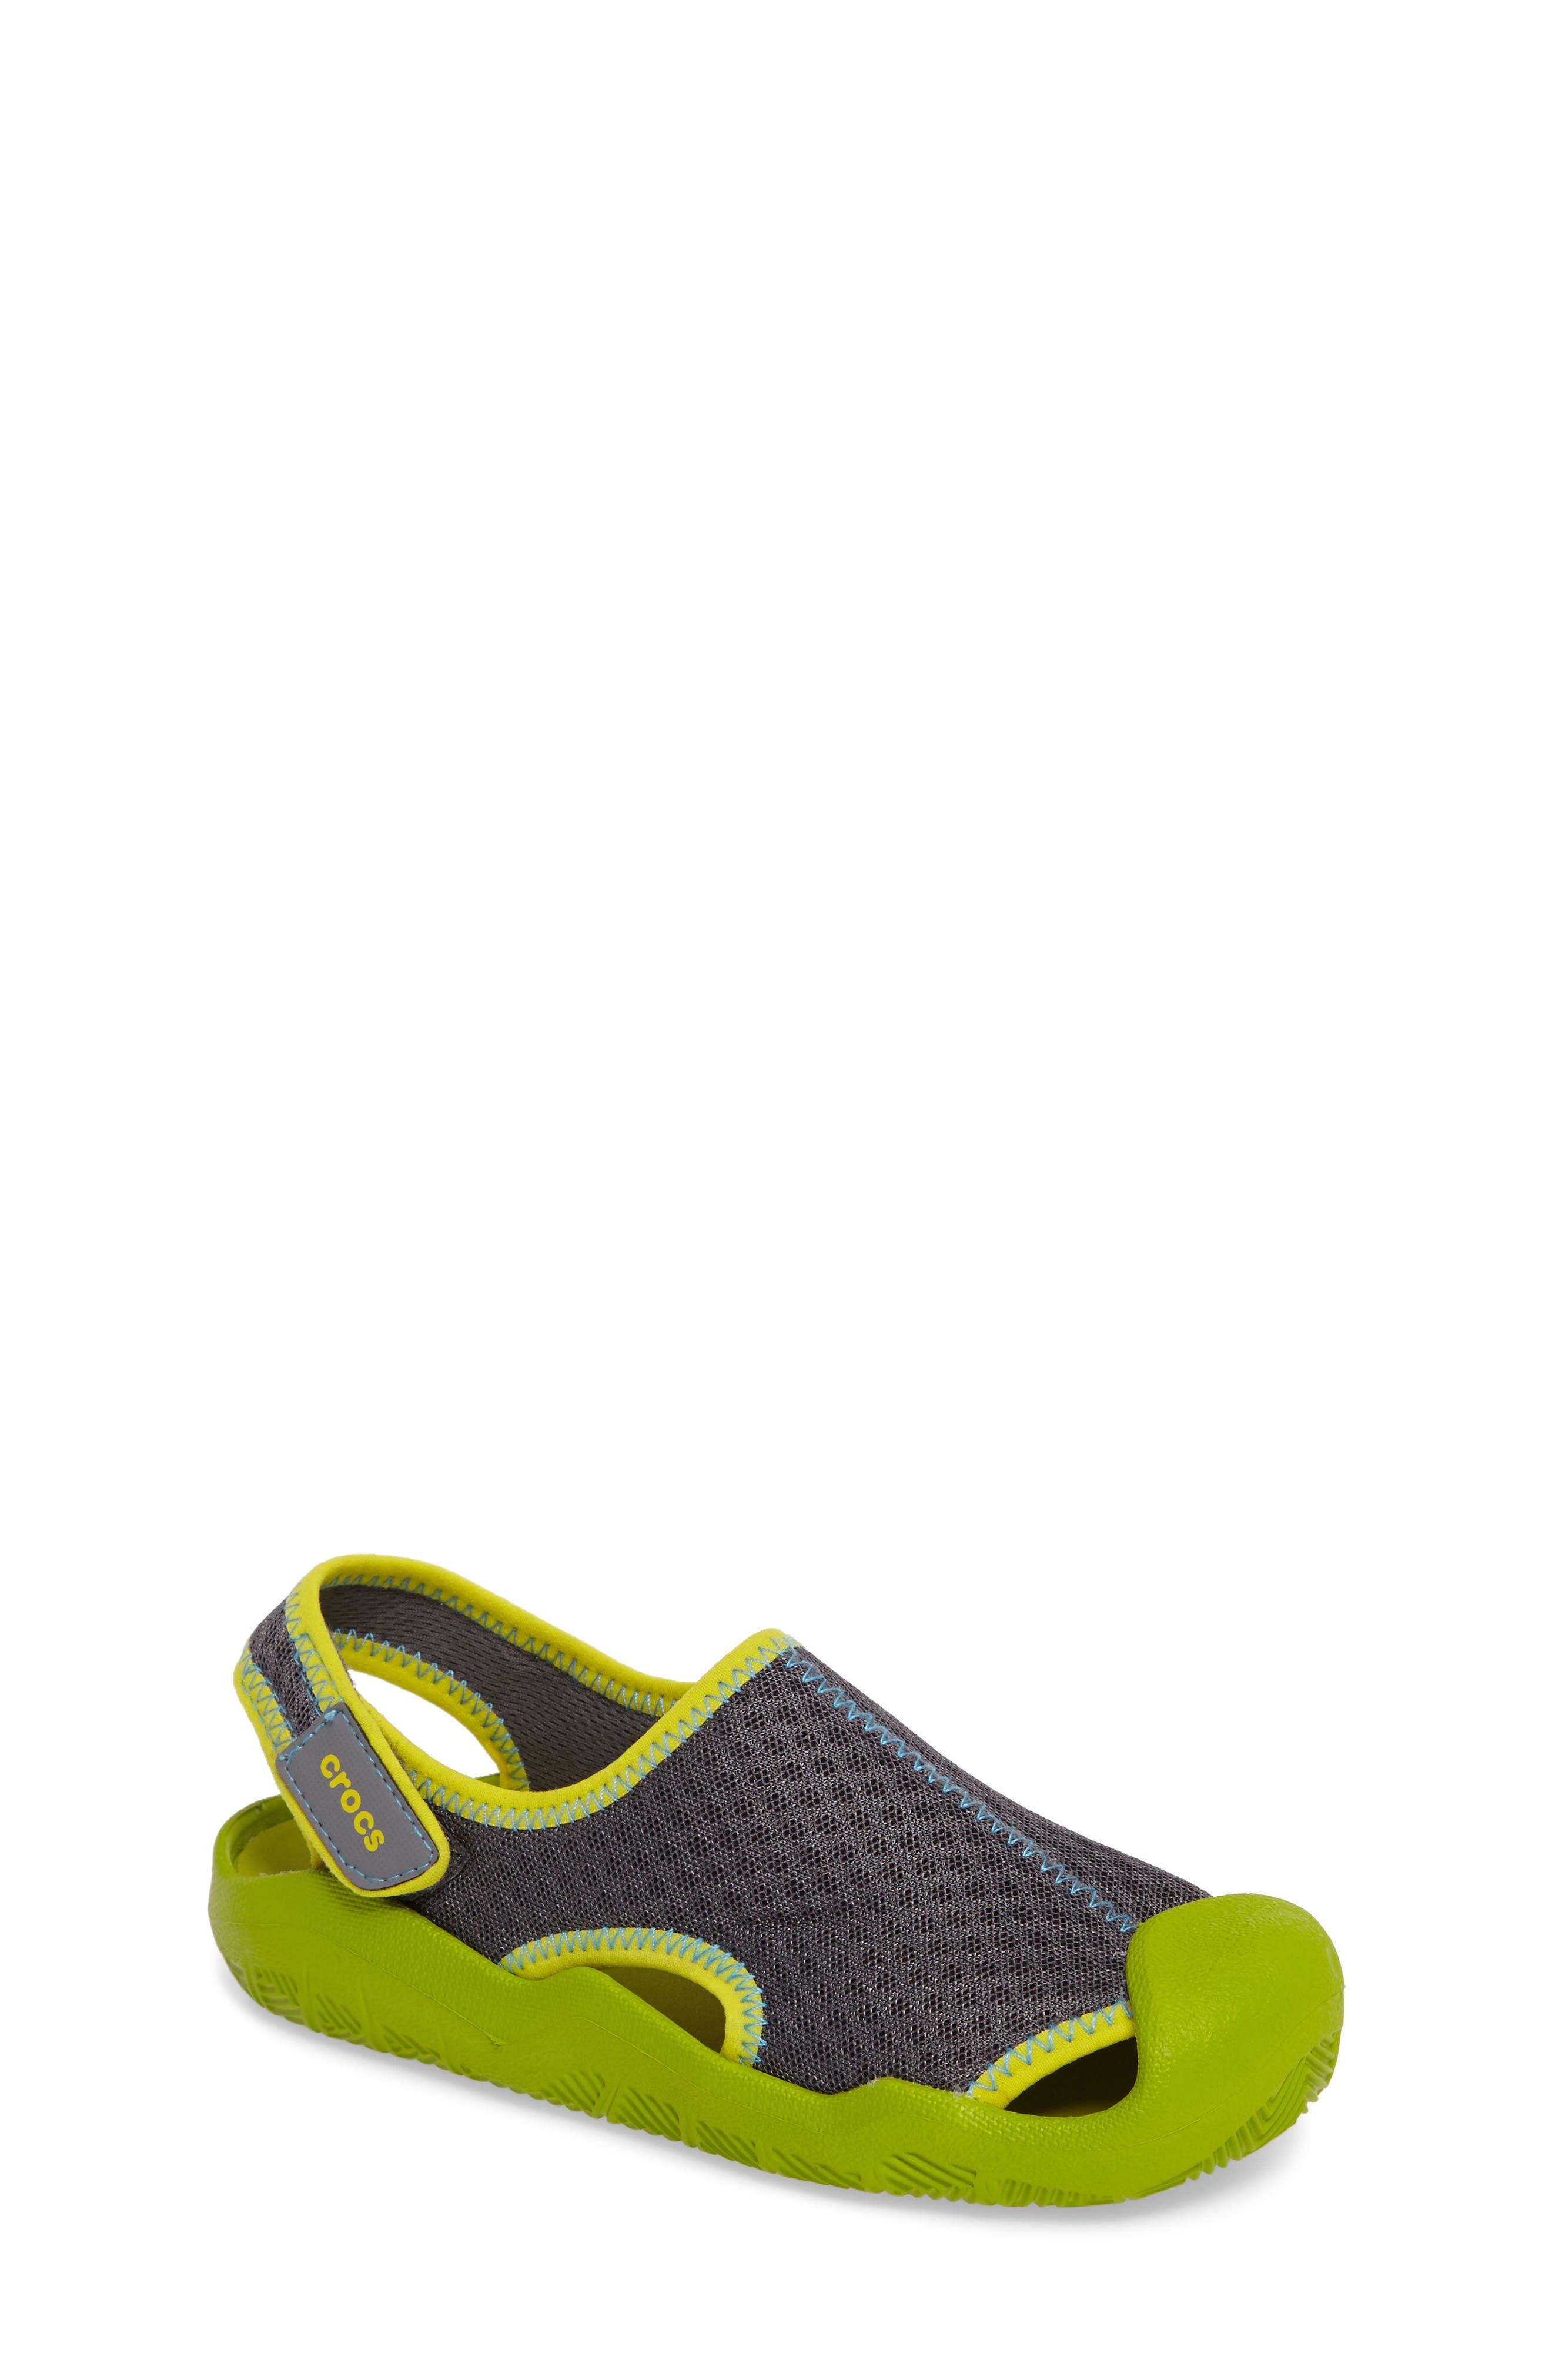 CROCS™ Swiftwater Sandal (Walker, Toddler & Little Kid)